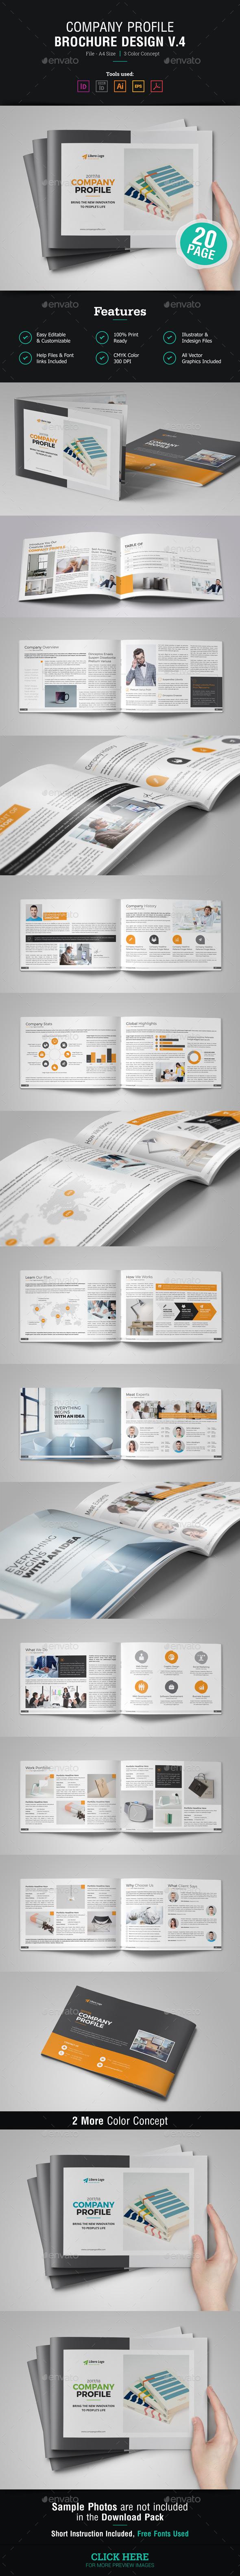 Company Profile Brochure Design v4 - Corporate Brochures